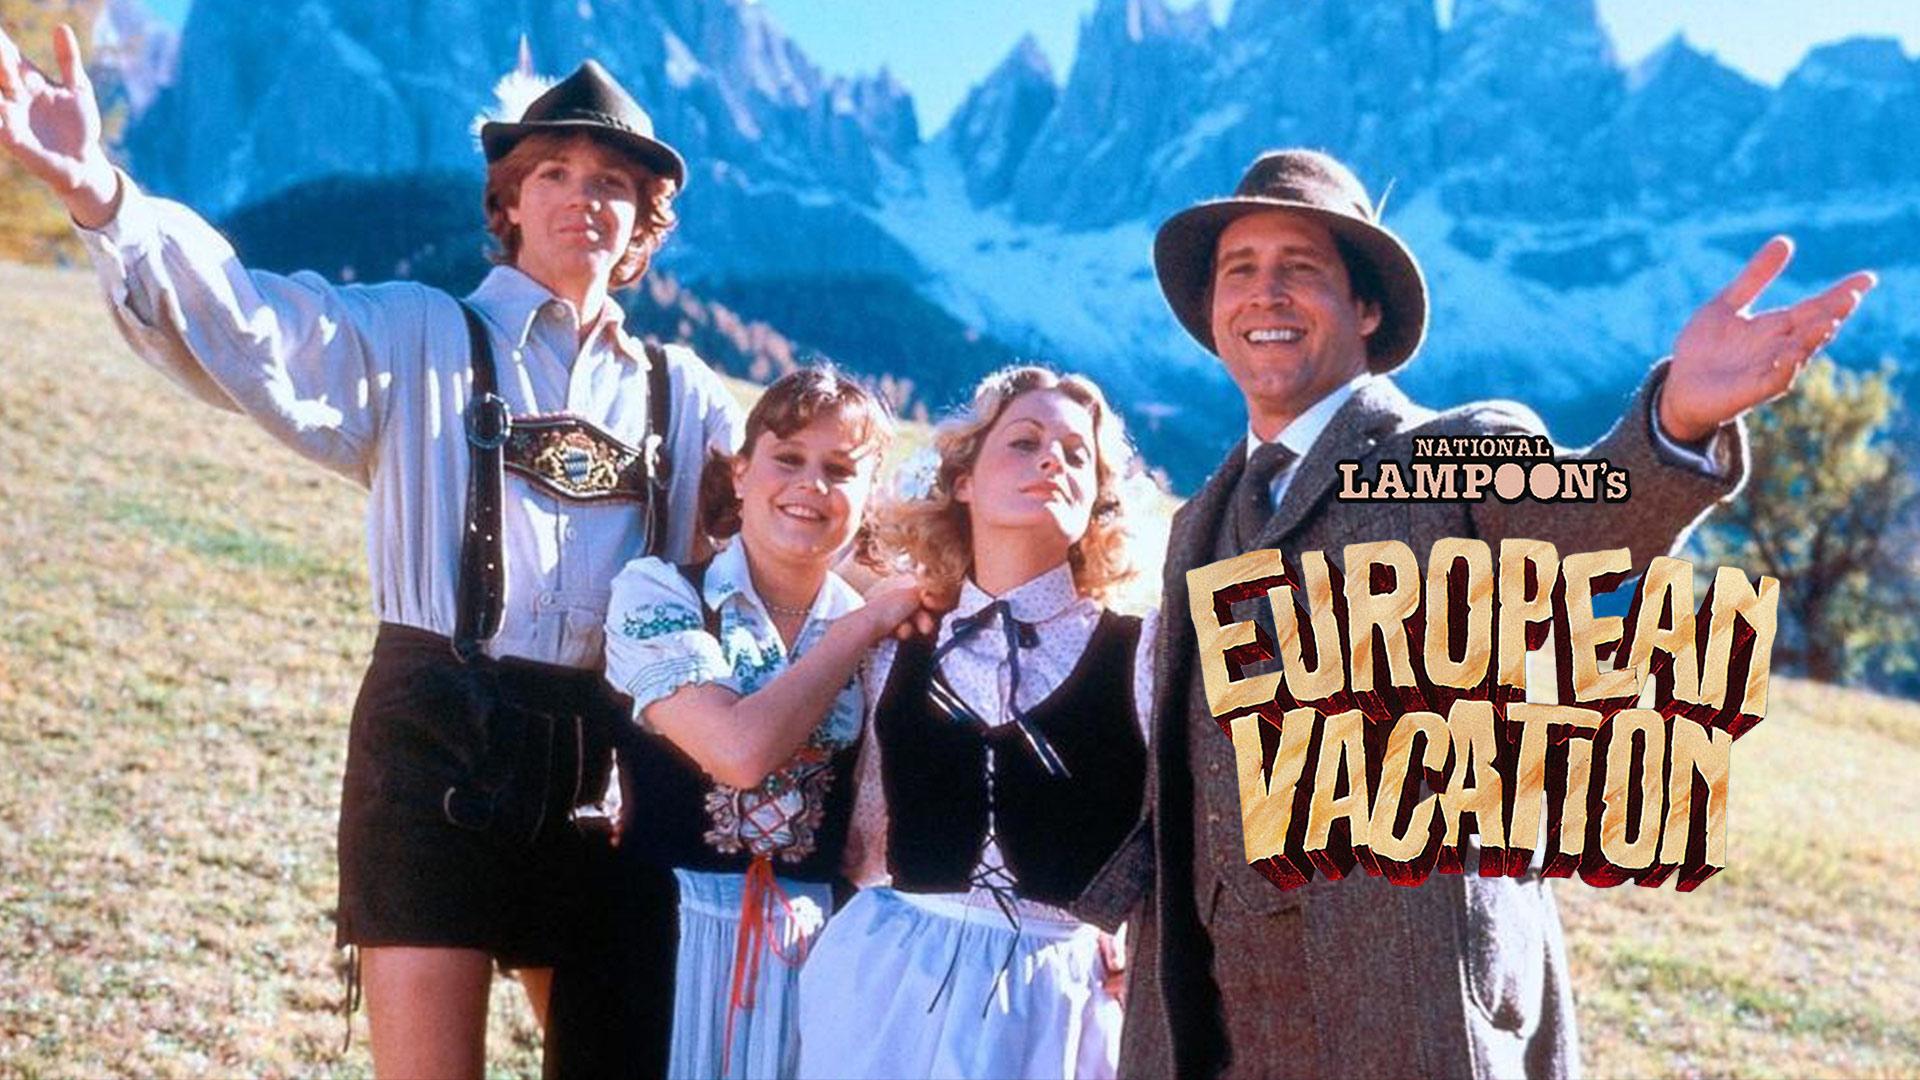 National Lampoon's European Vaca